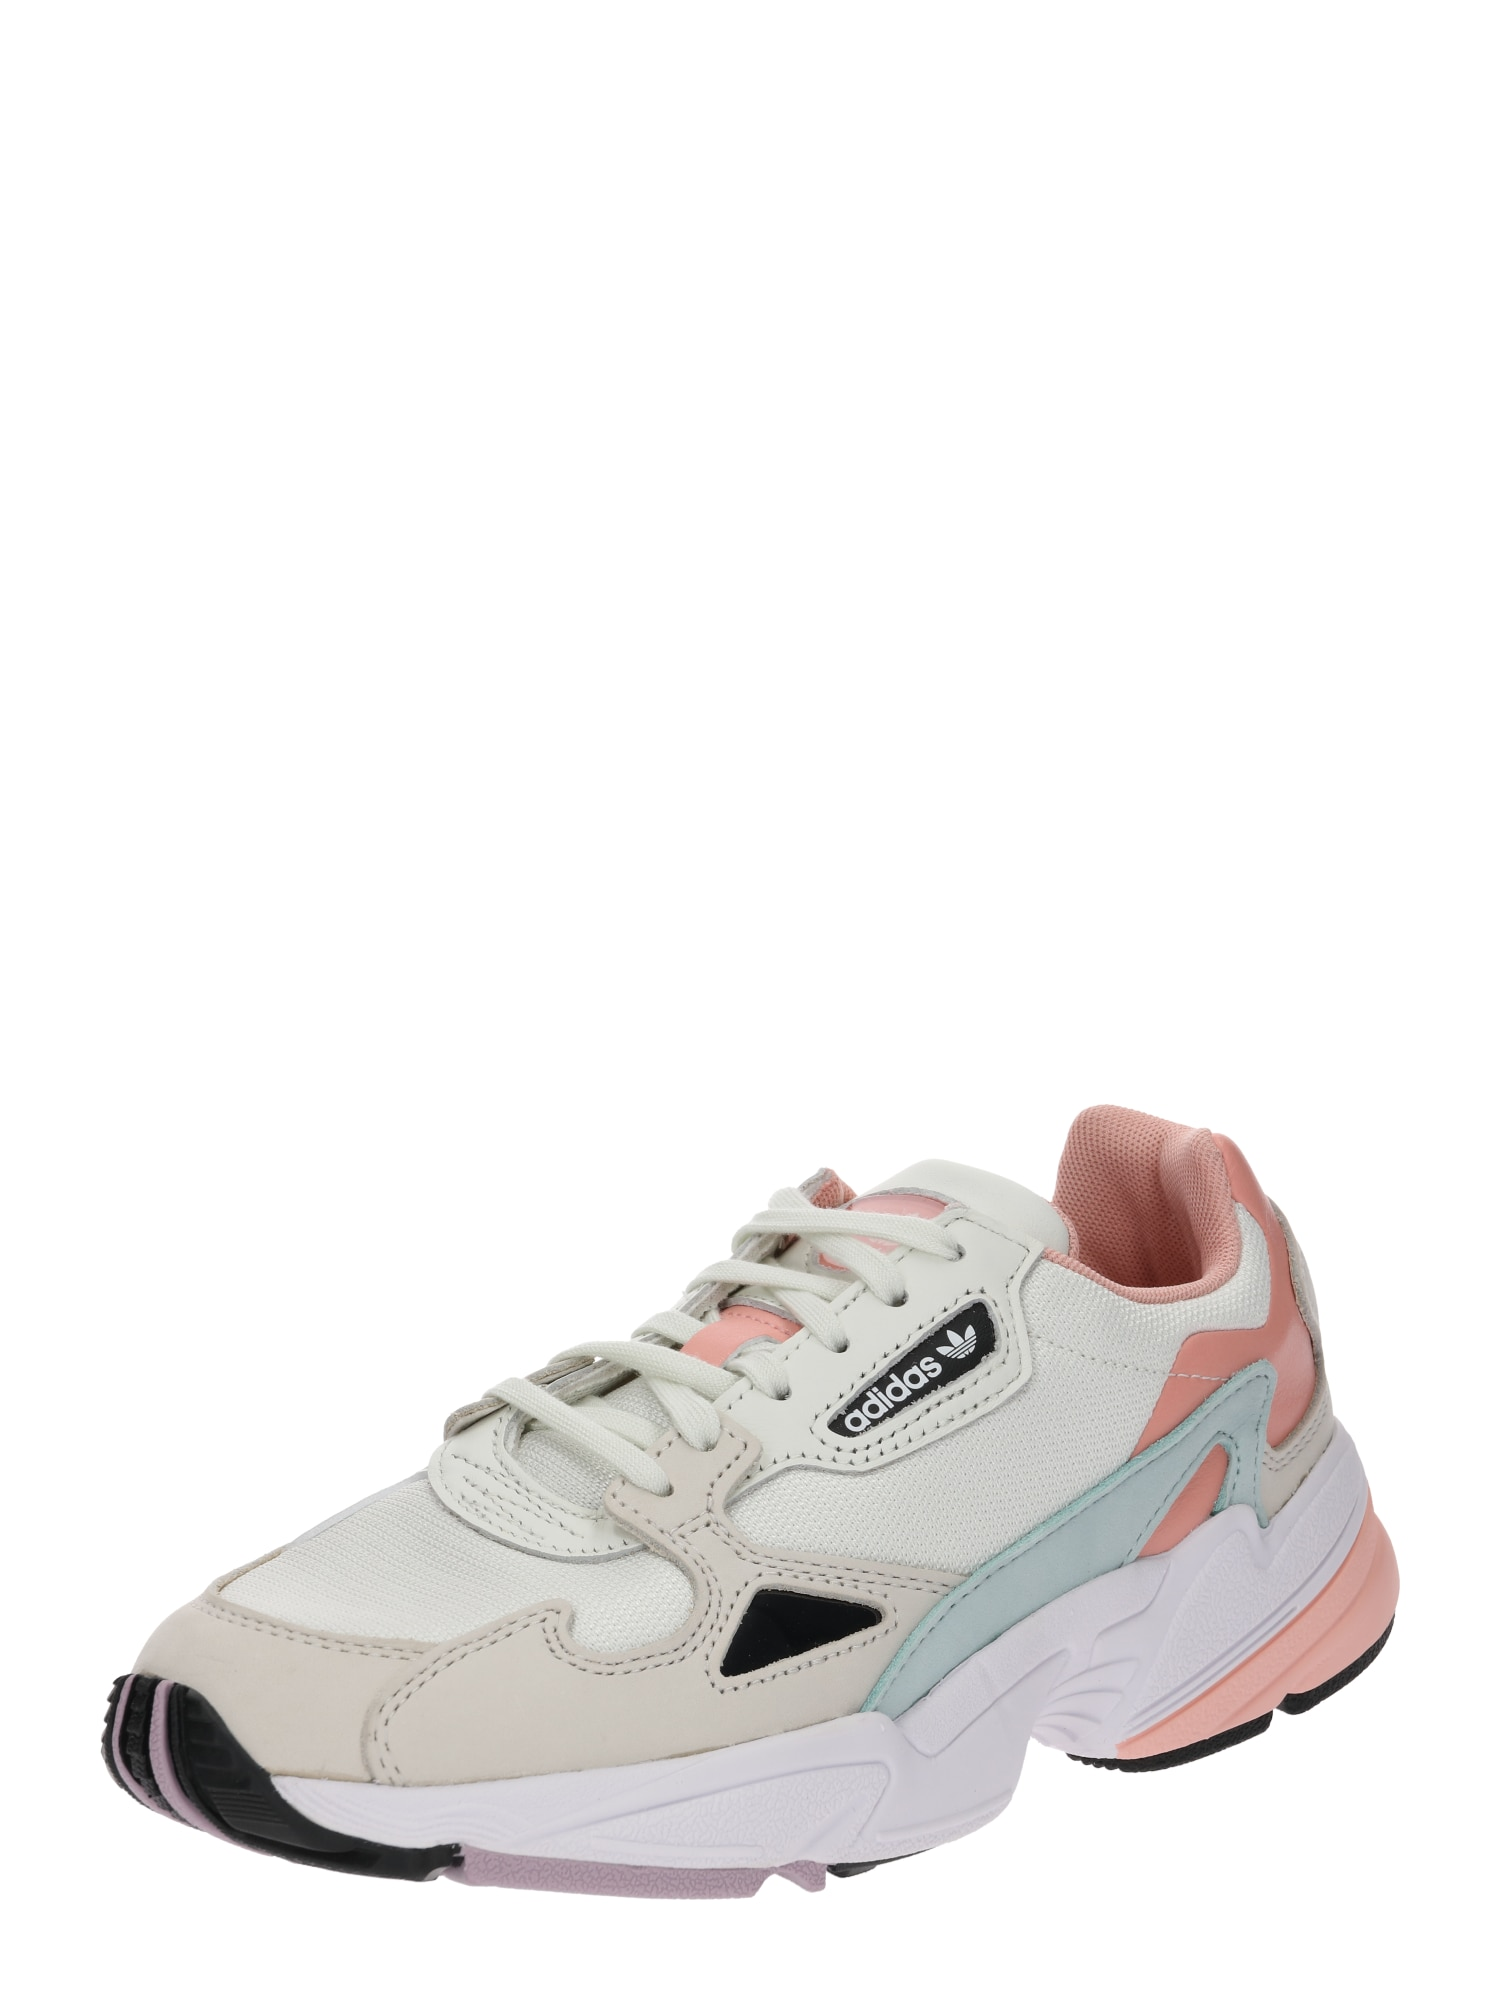 Sneaker 'Falcon' | Schuhe > Sneaker > Sneaker | Petrol - Koralle - Weiß | ADIDAS ORIGINALS